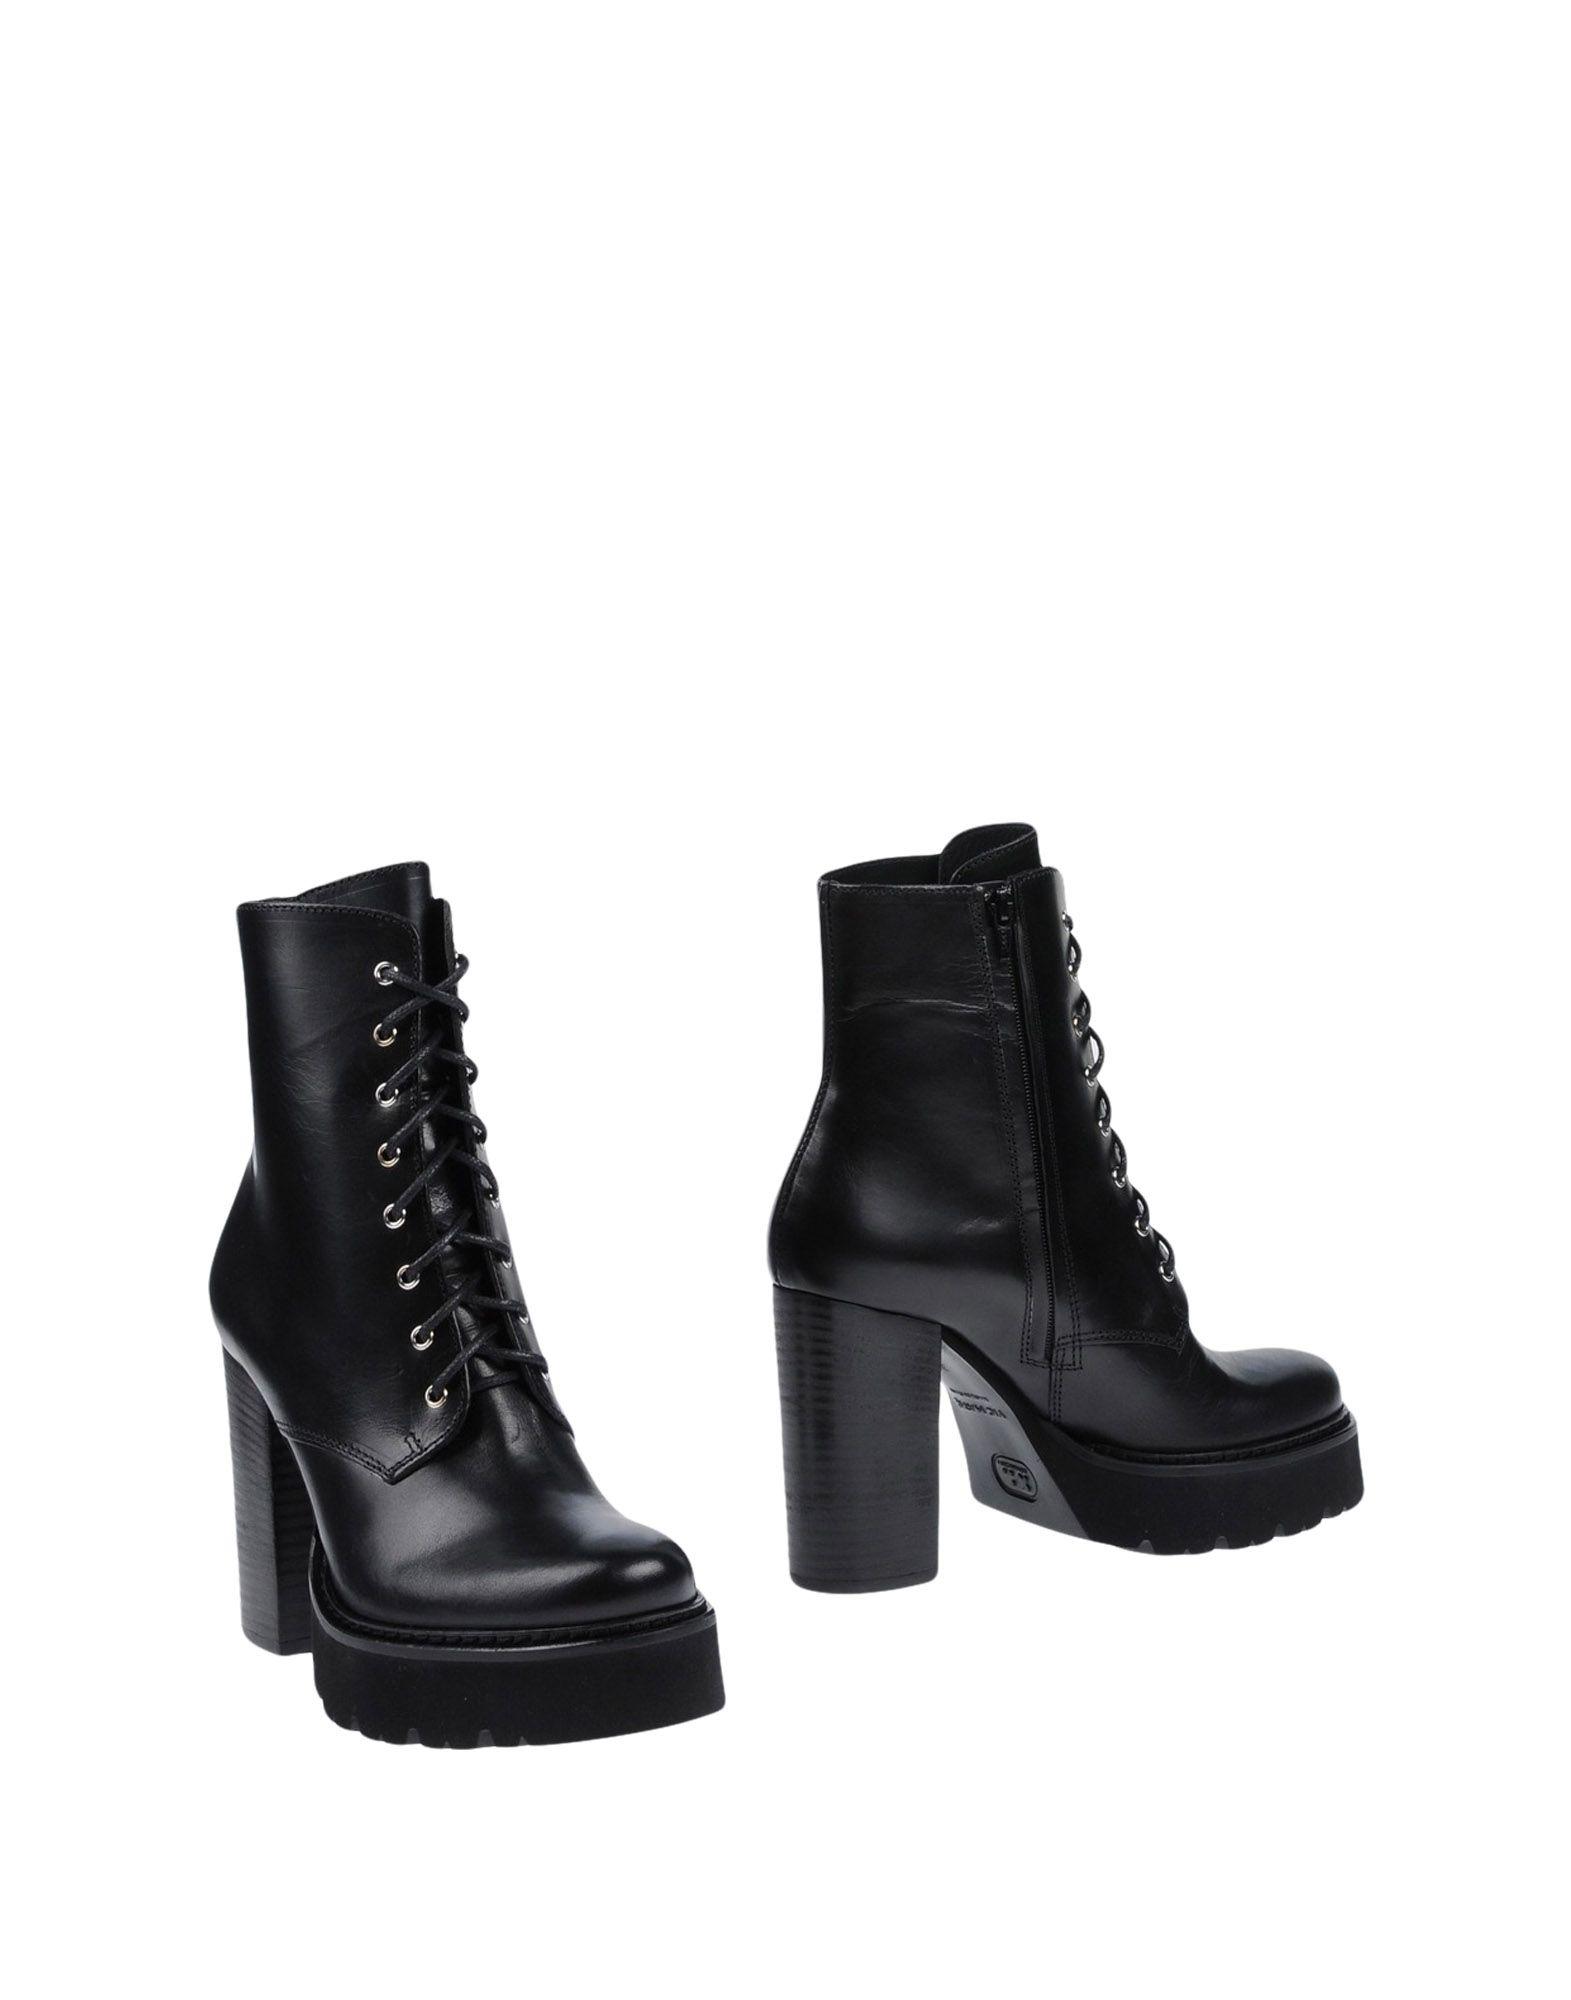 Vic Matiē Stiefelette strapazierfähige Damen  11457502KTGut aussehende strapazierfähige Stiefelette Schuhe 4e61ff